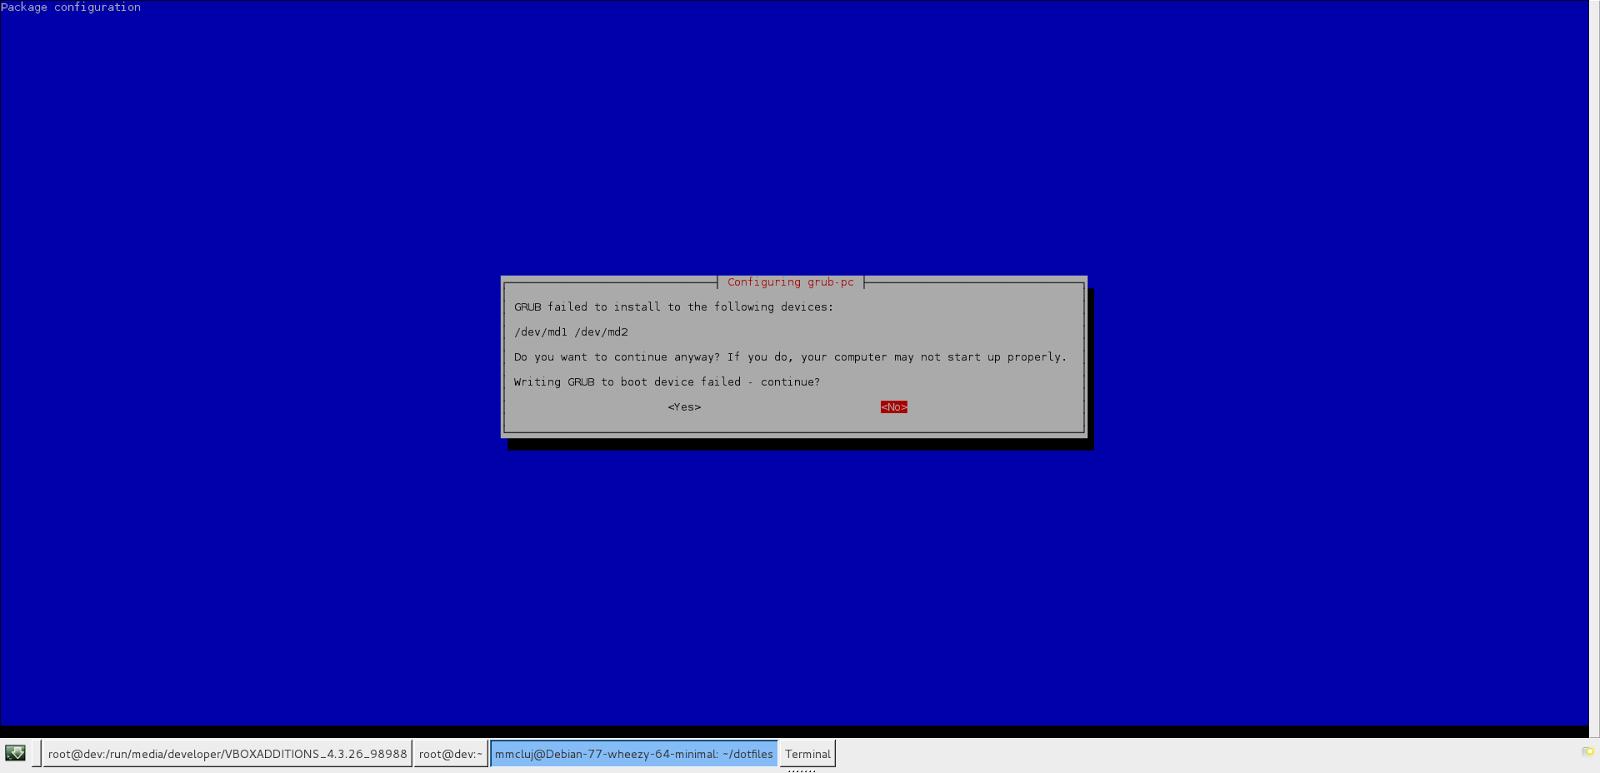 GRUB install error on /dev/mda1 and /dev/mda2 when upgrading Debian from Wheezy to Jessie